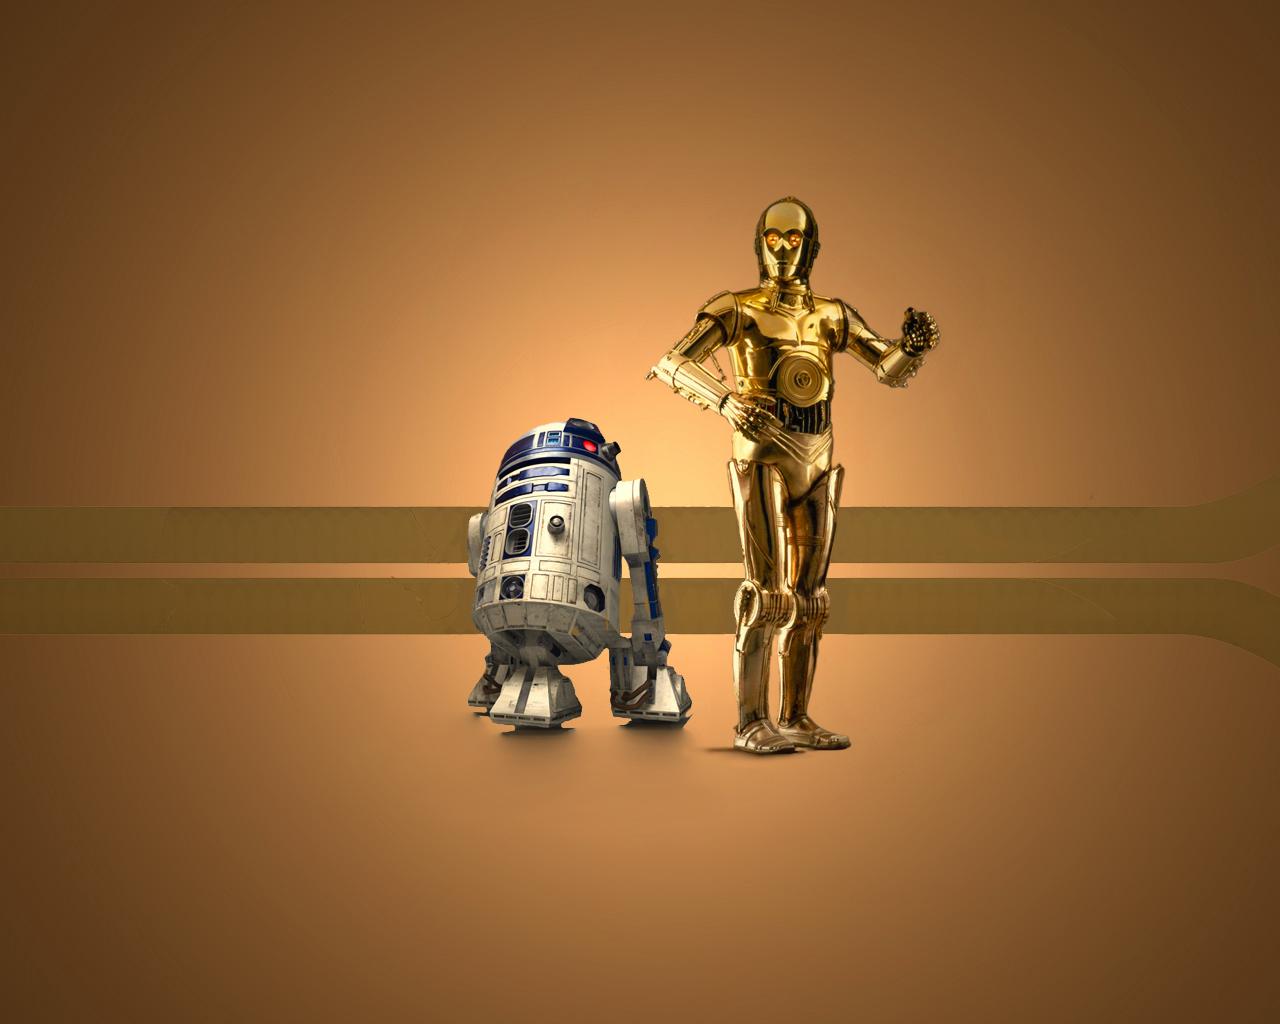 Image Result For Star Wars Bb